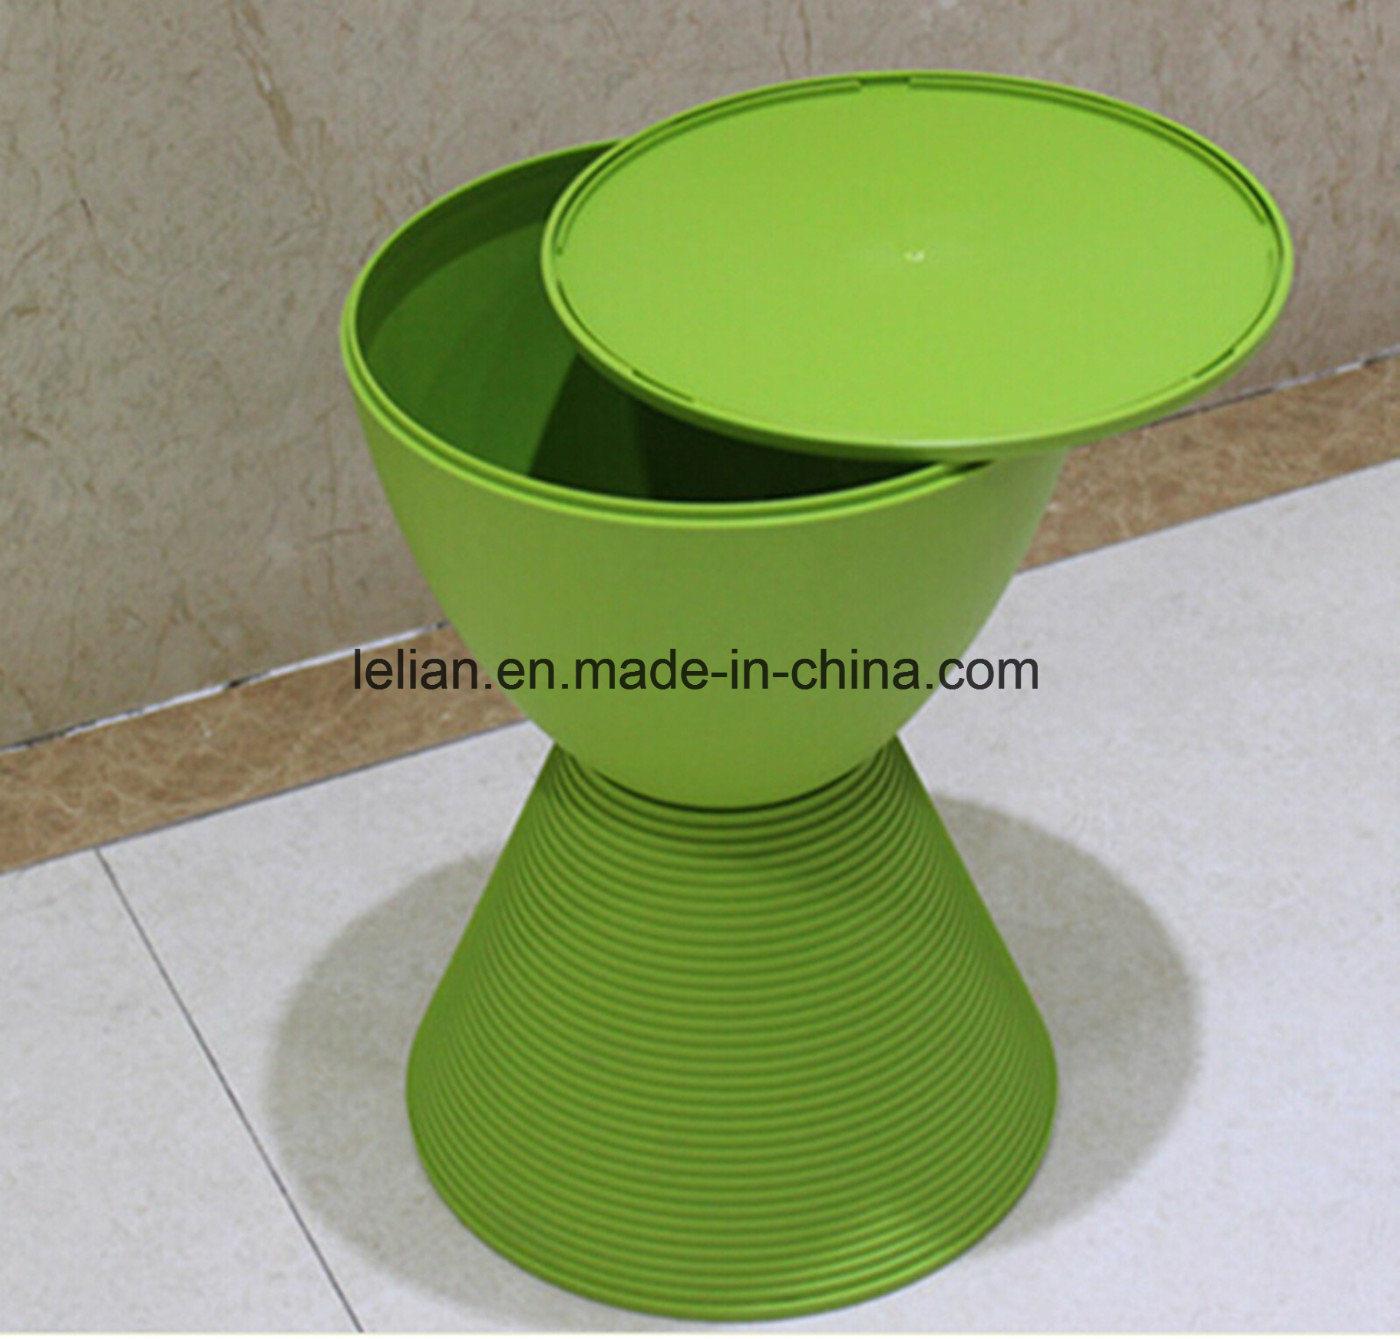 Plastic Stool Prince Aha Stools Replica Designed Stool (LL-0059)